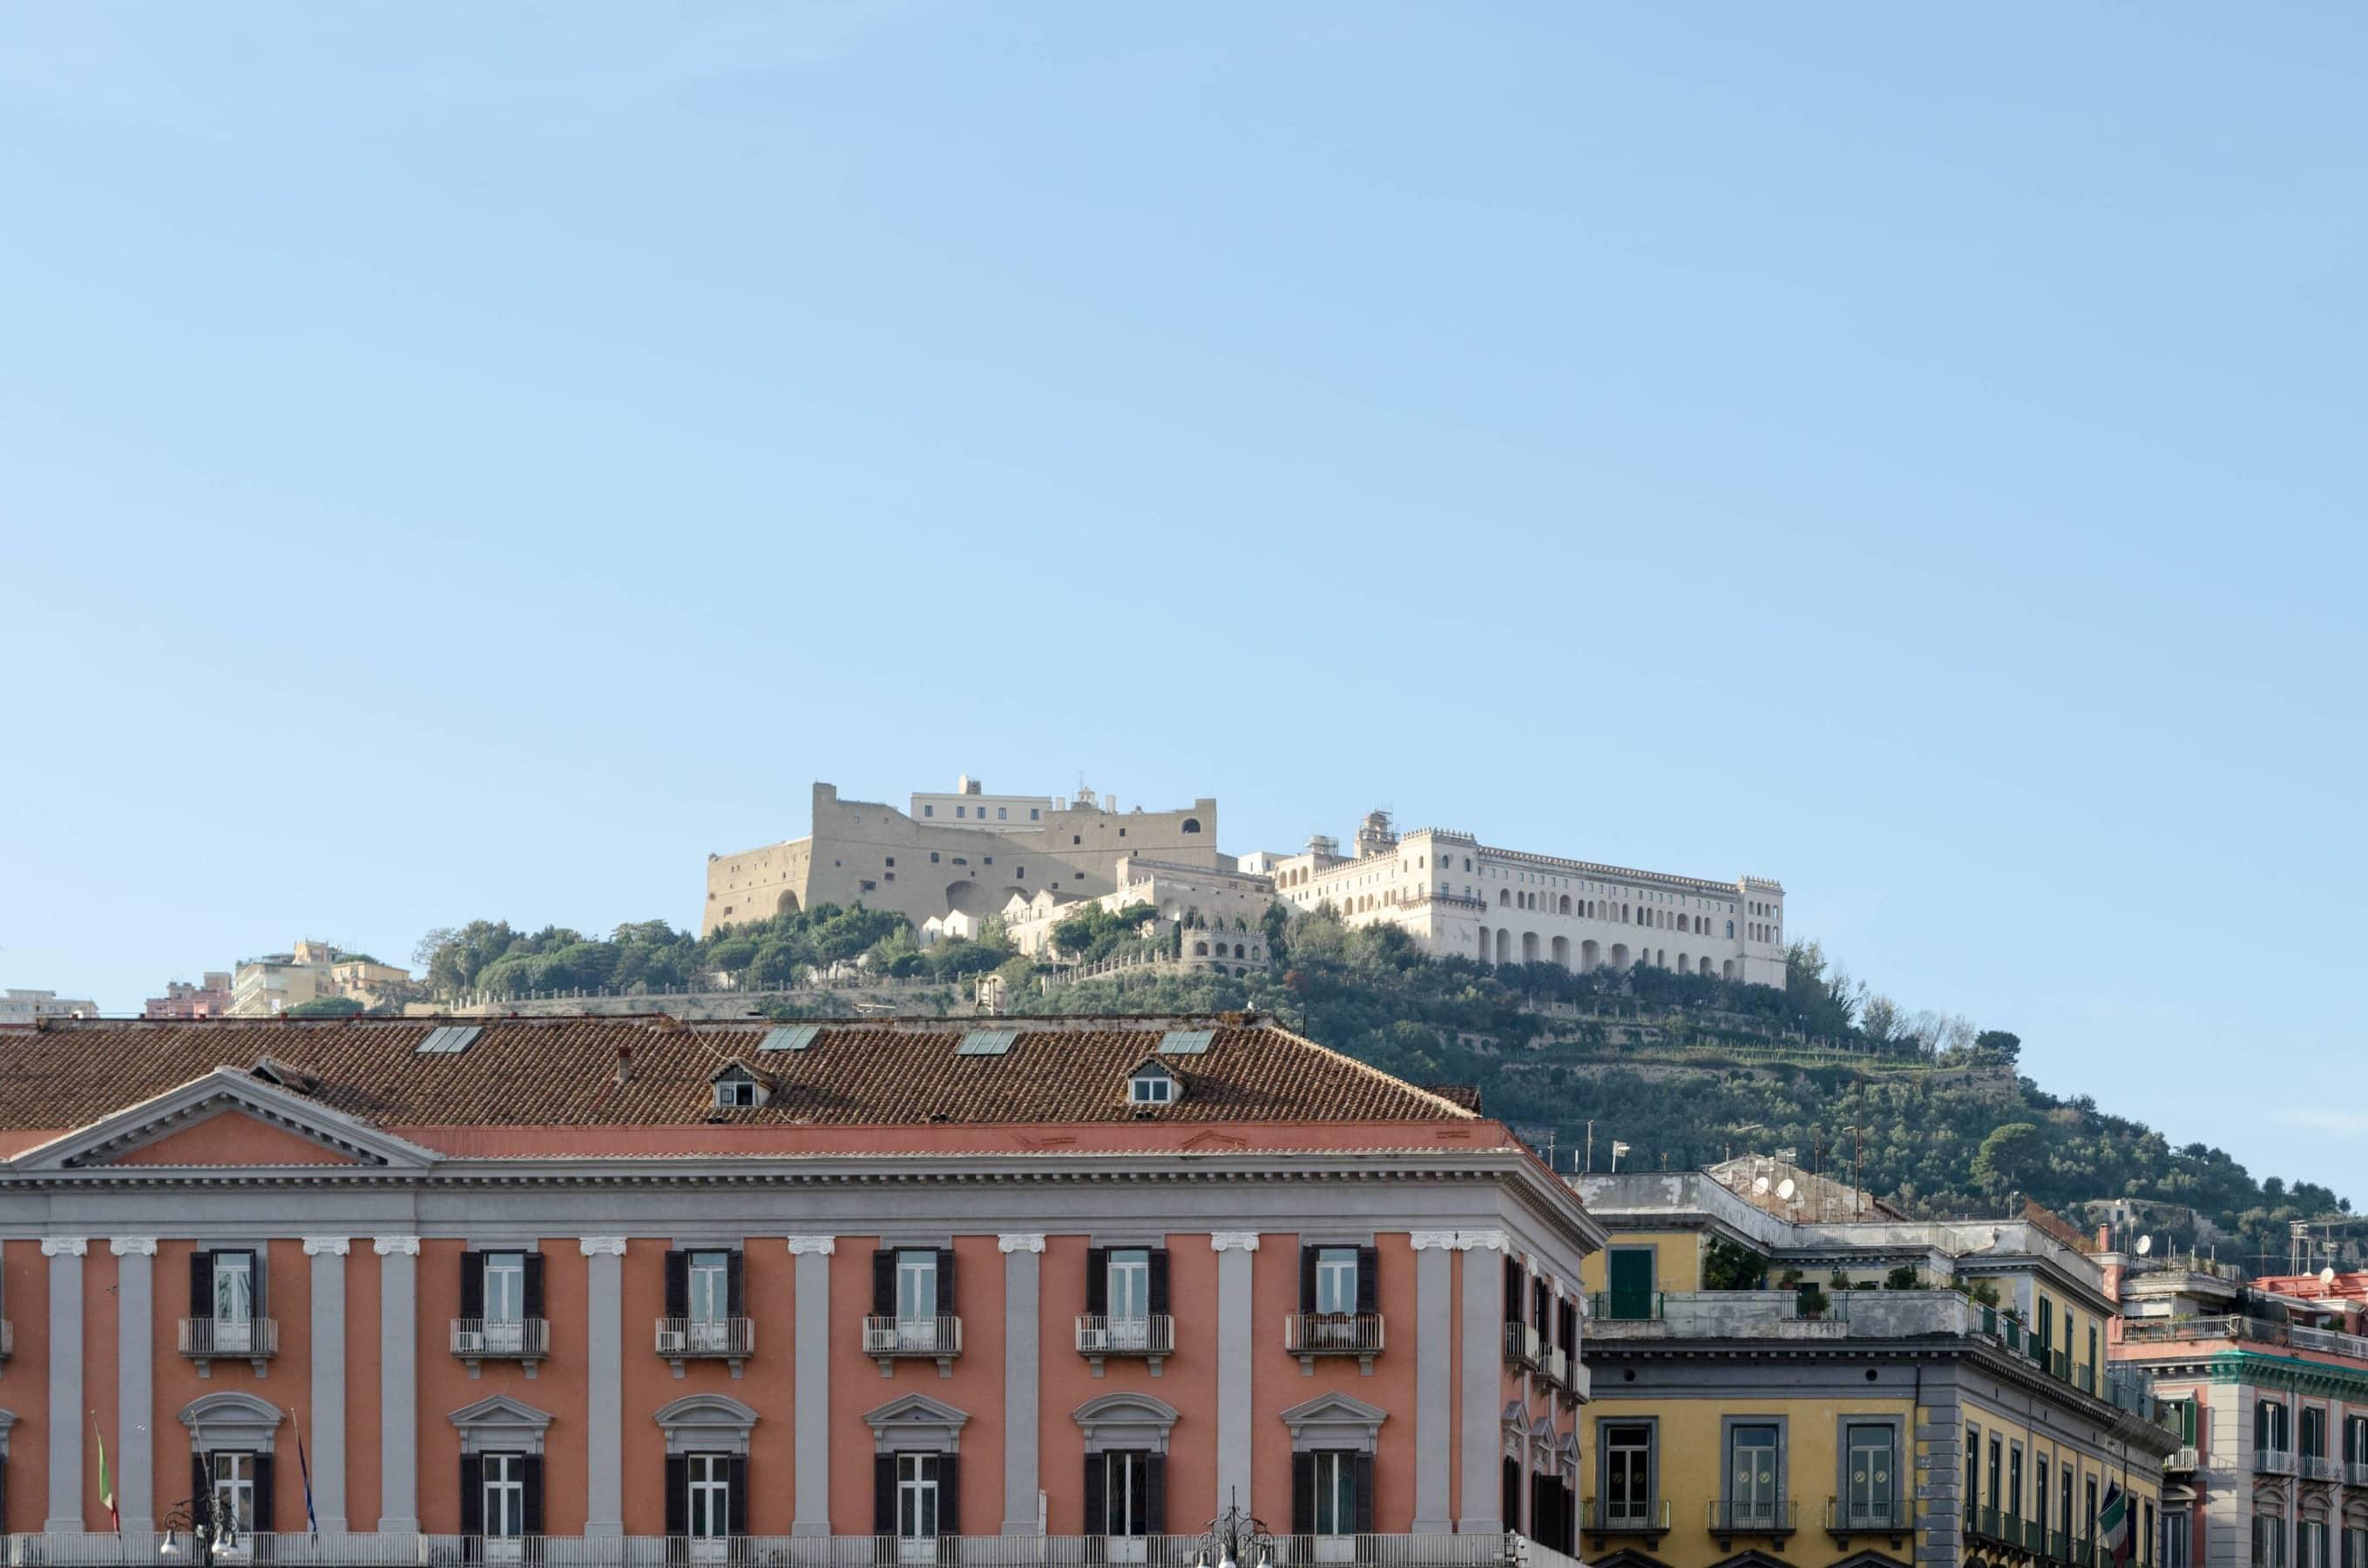 Castell San Elmo Neapel